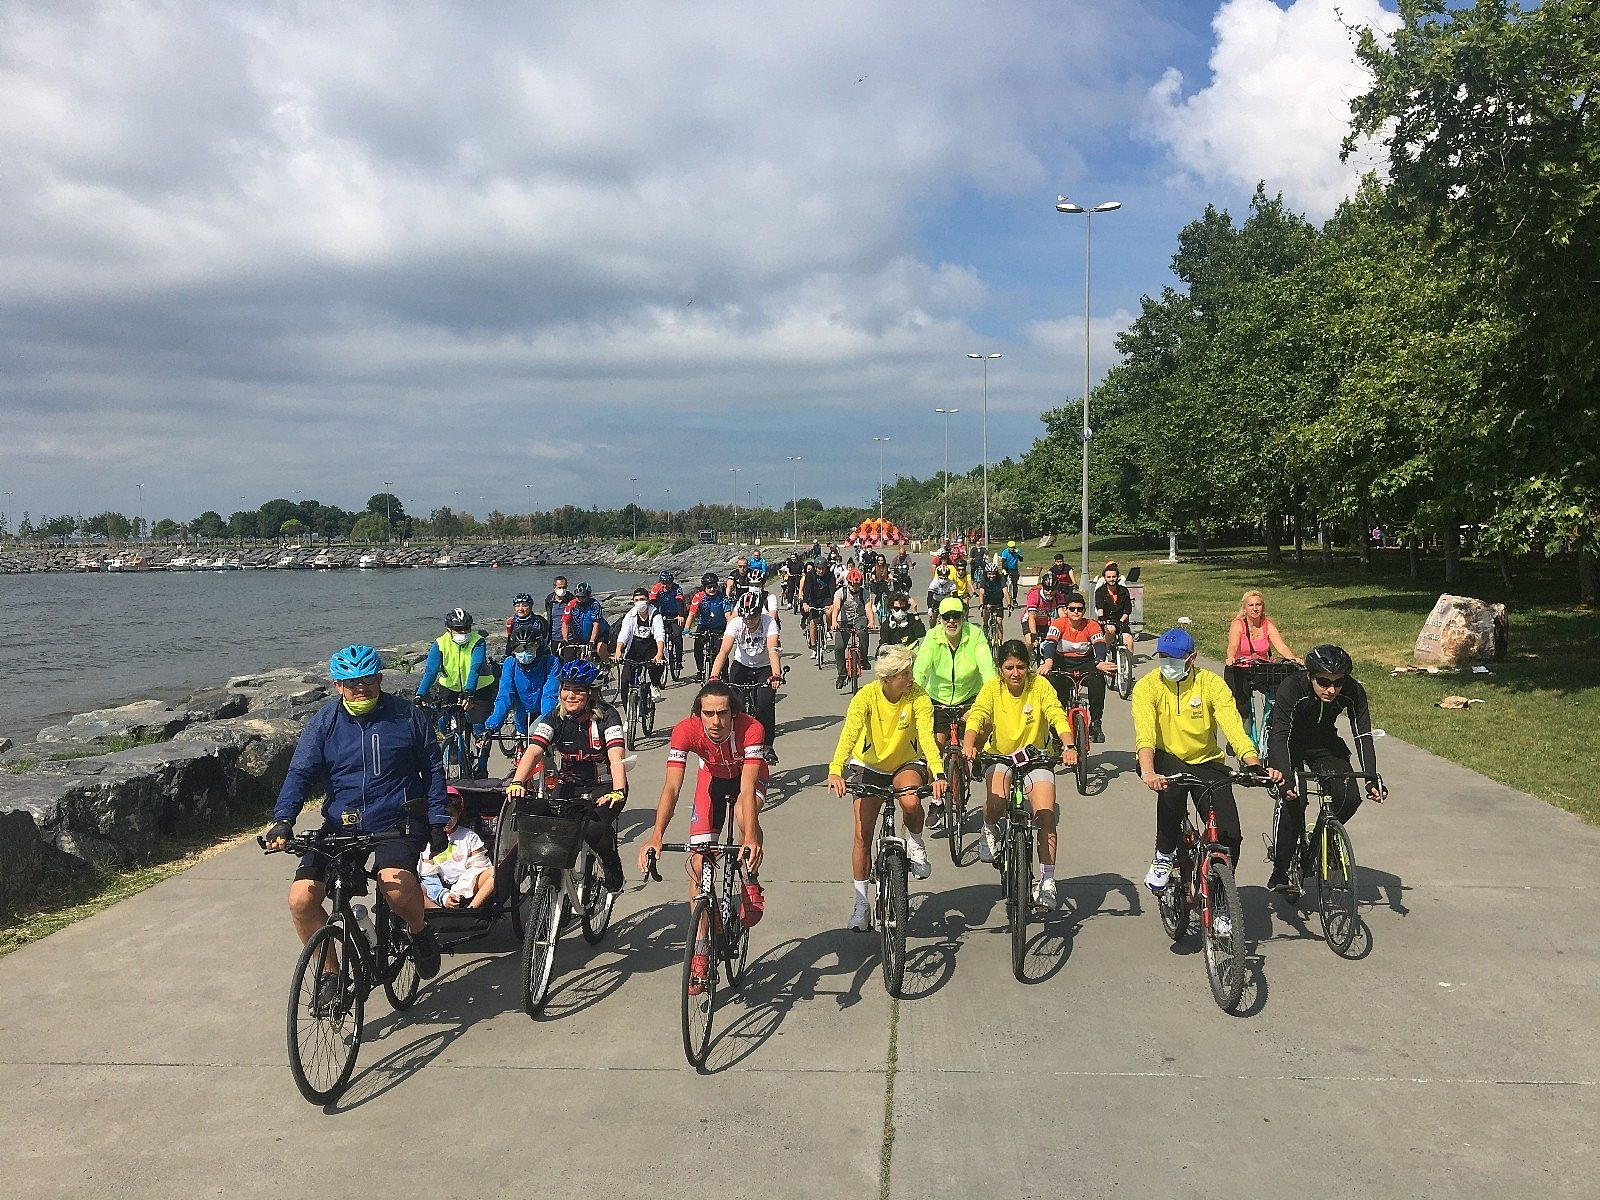 2021/06/avcilarda-bisikletseverler-dunya-bisiklet-gunu-icin-pedal-cevirdi-20210603AW33-4.jpg